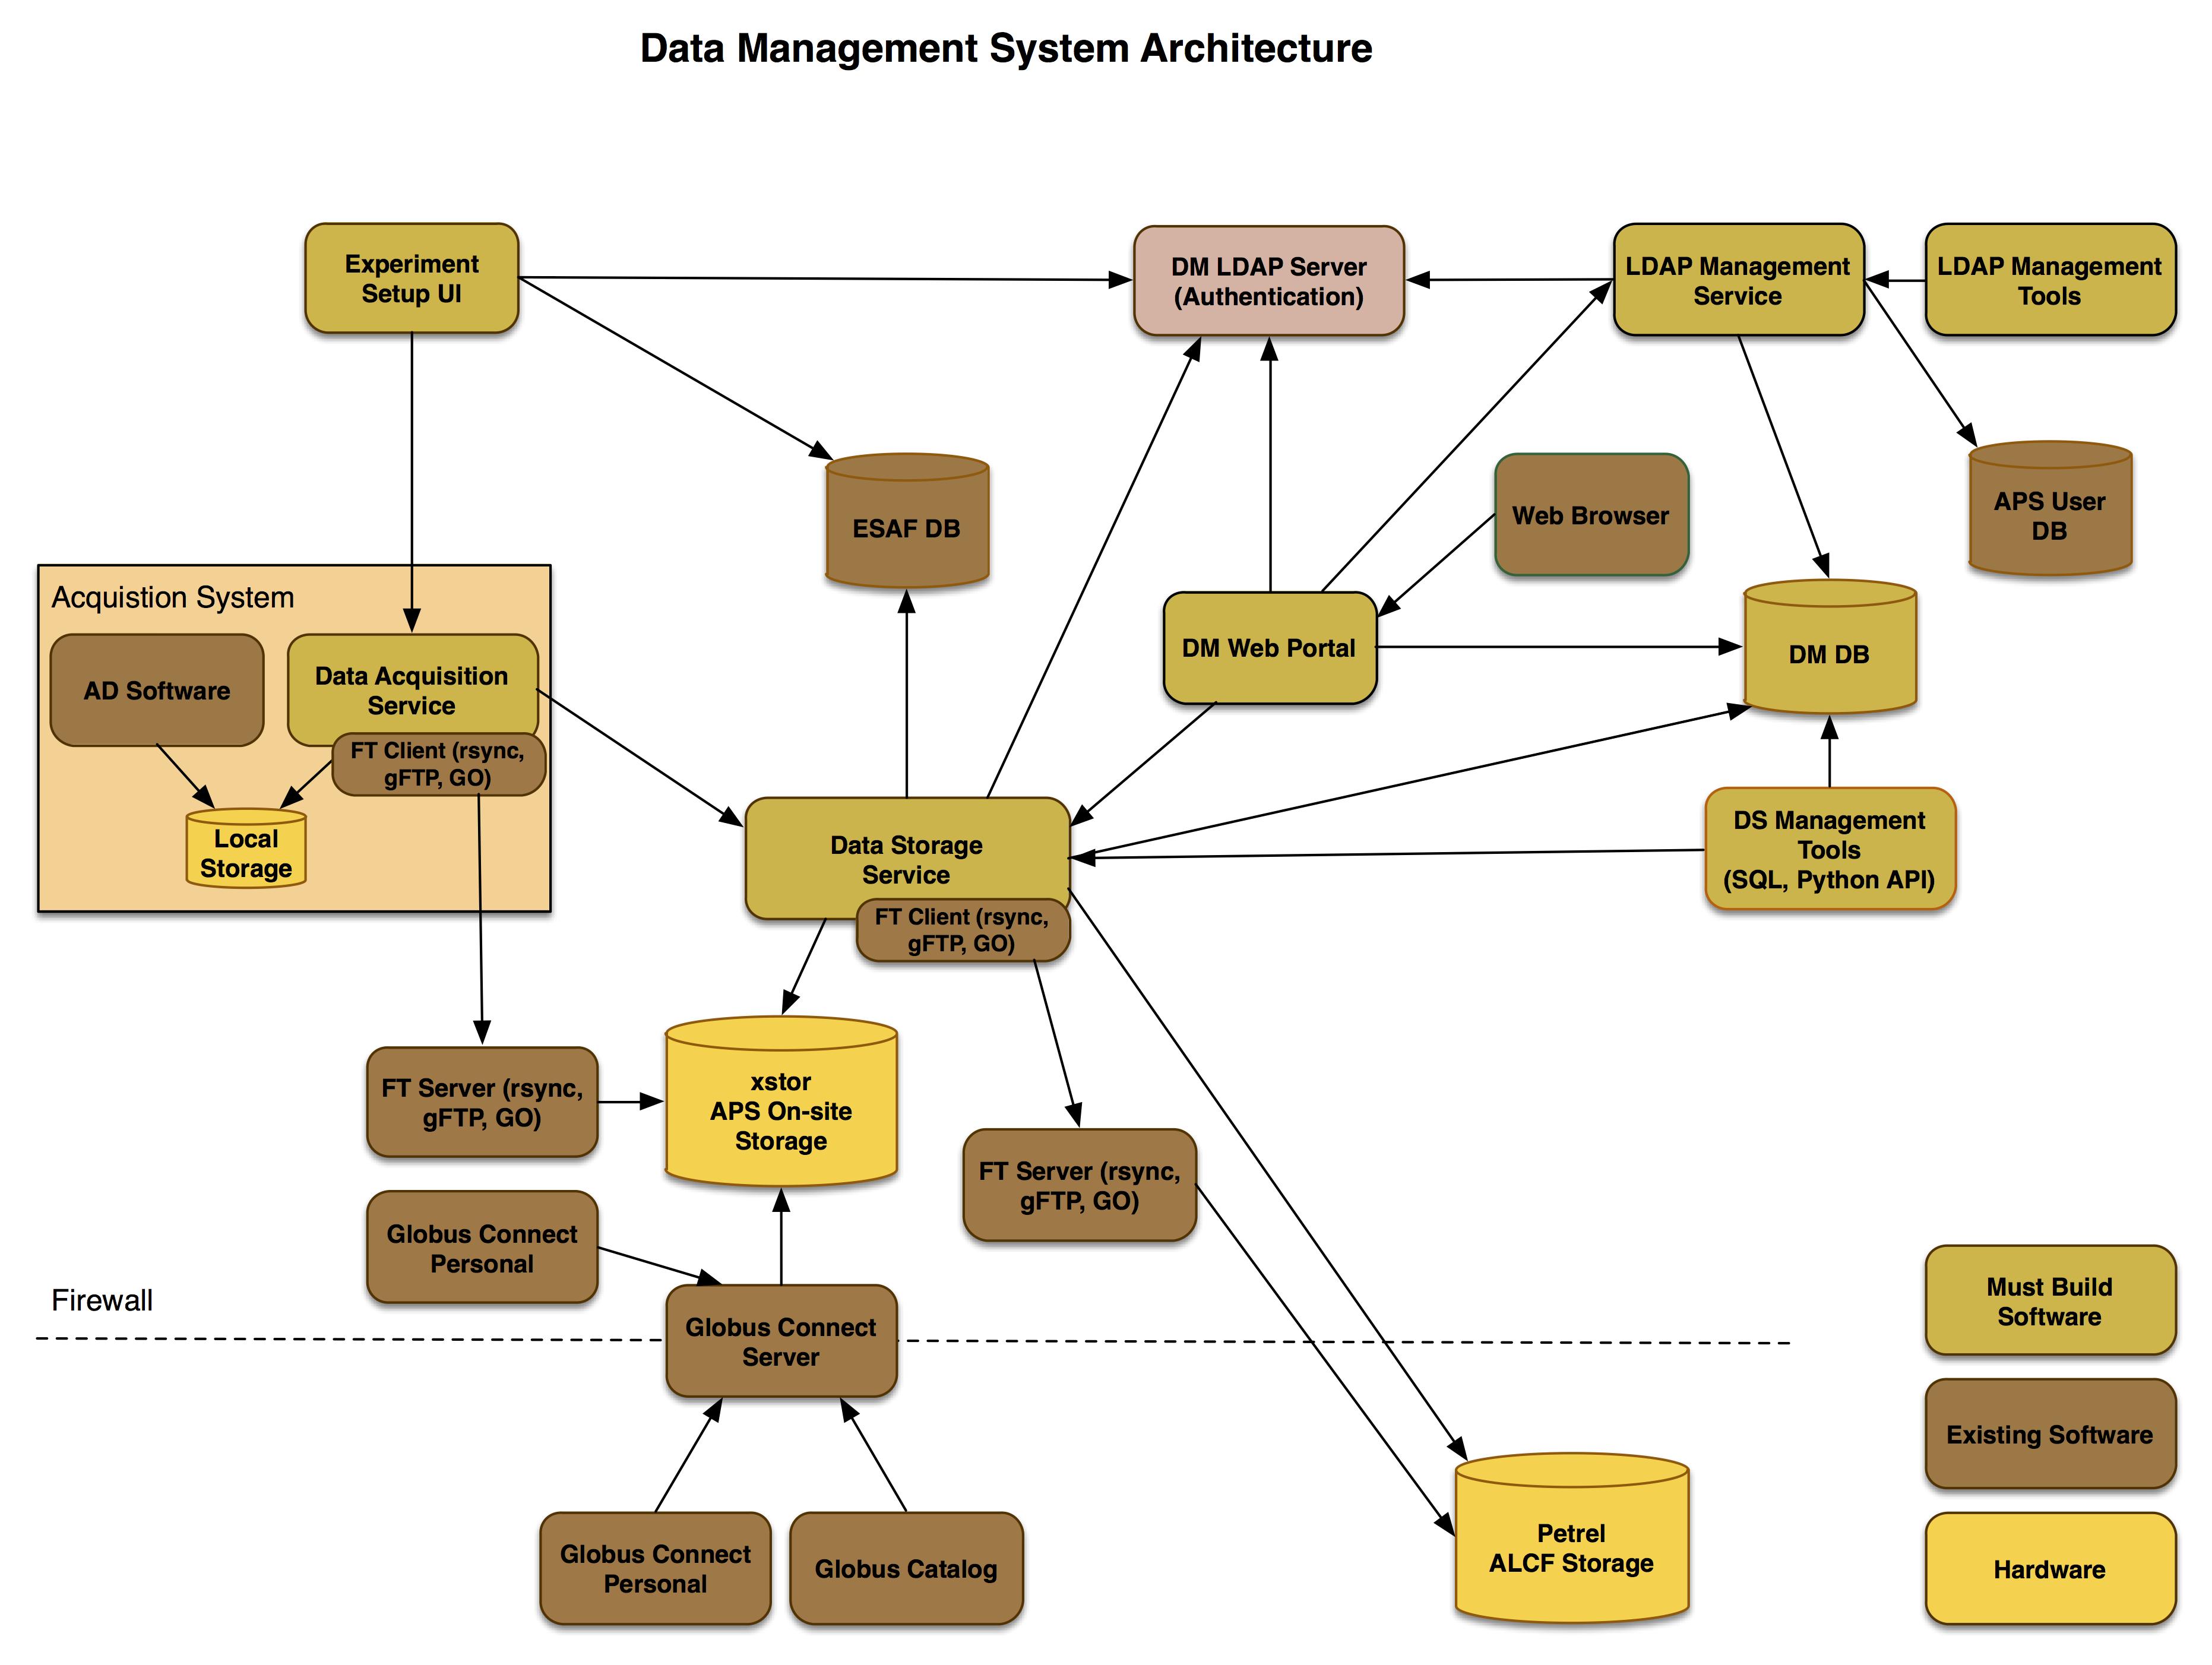 APS Data Management System Architecture